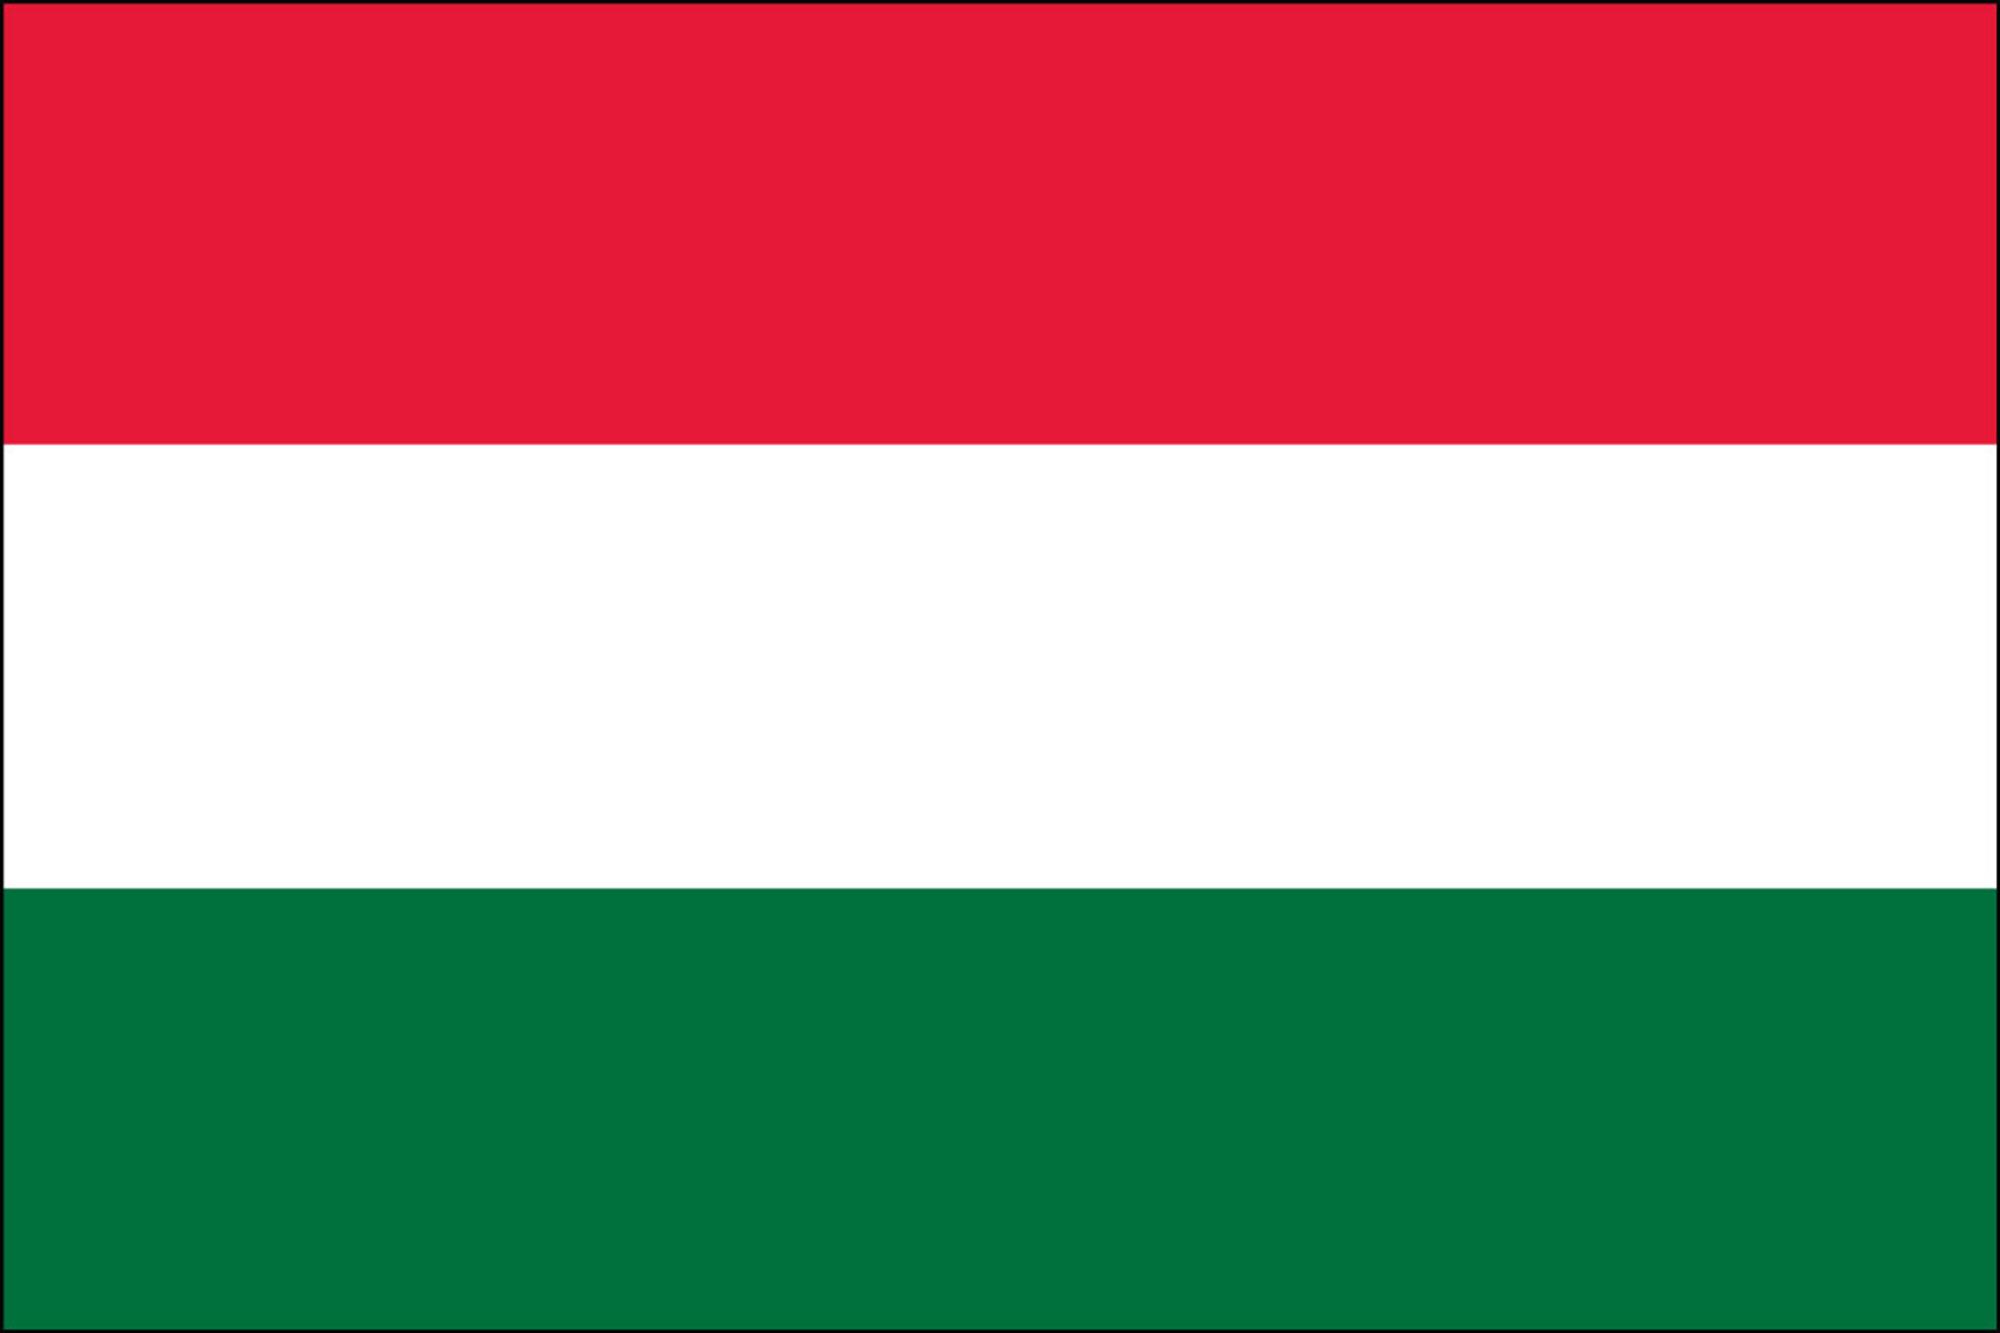 Hungary Flags